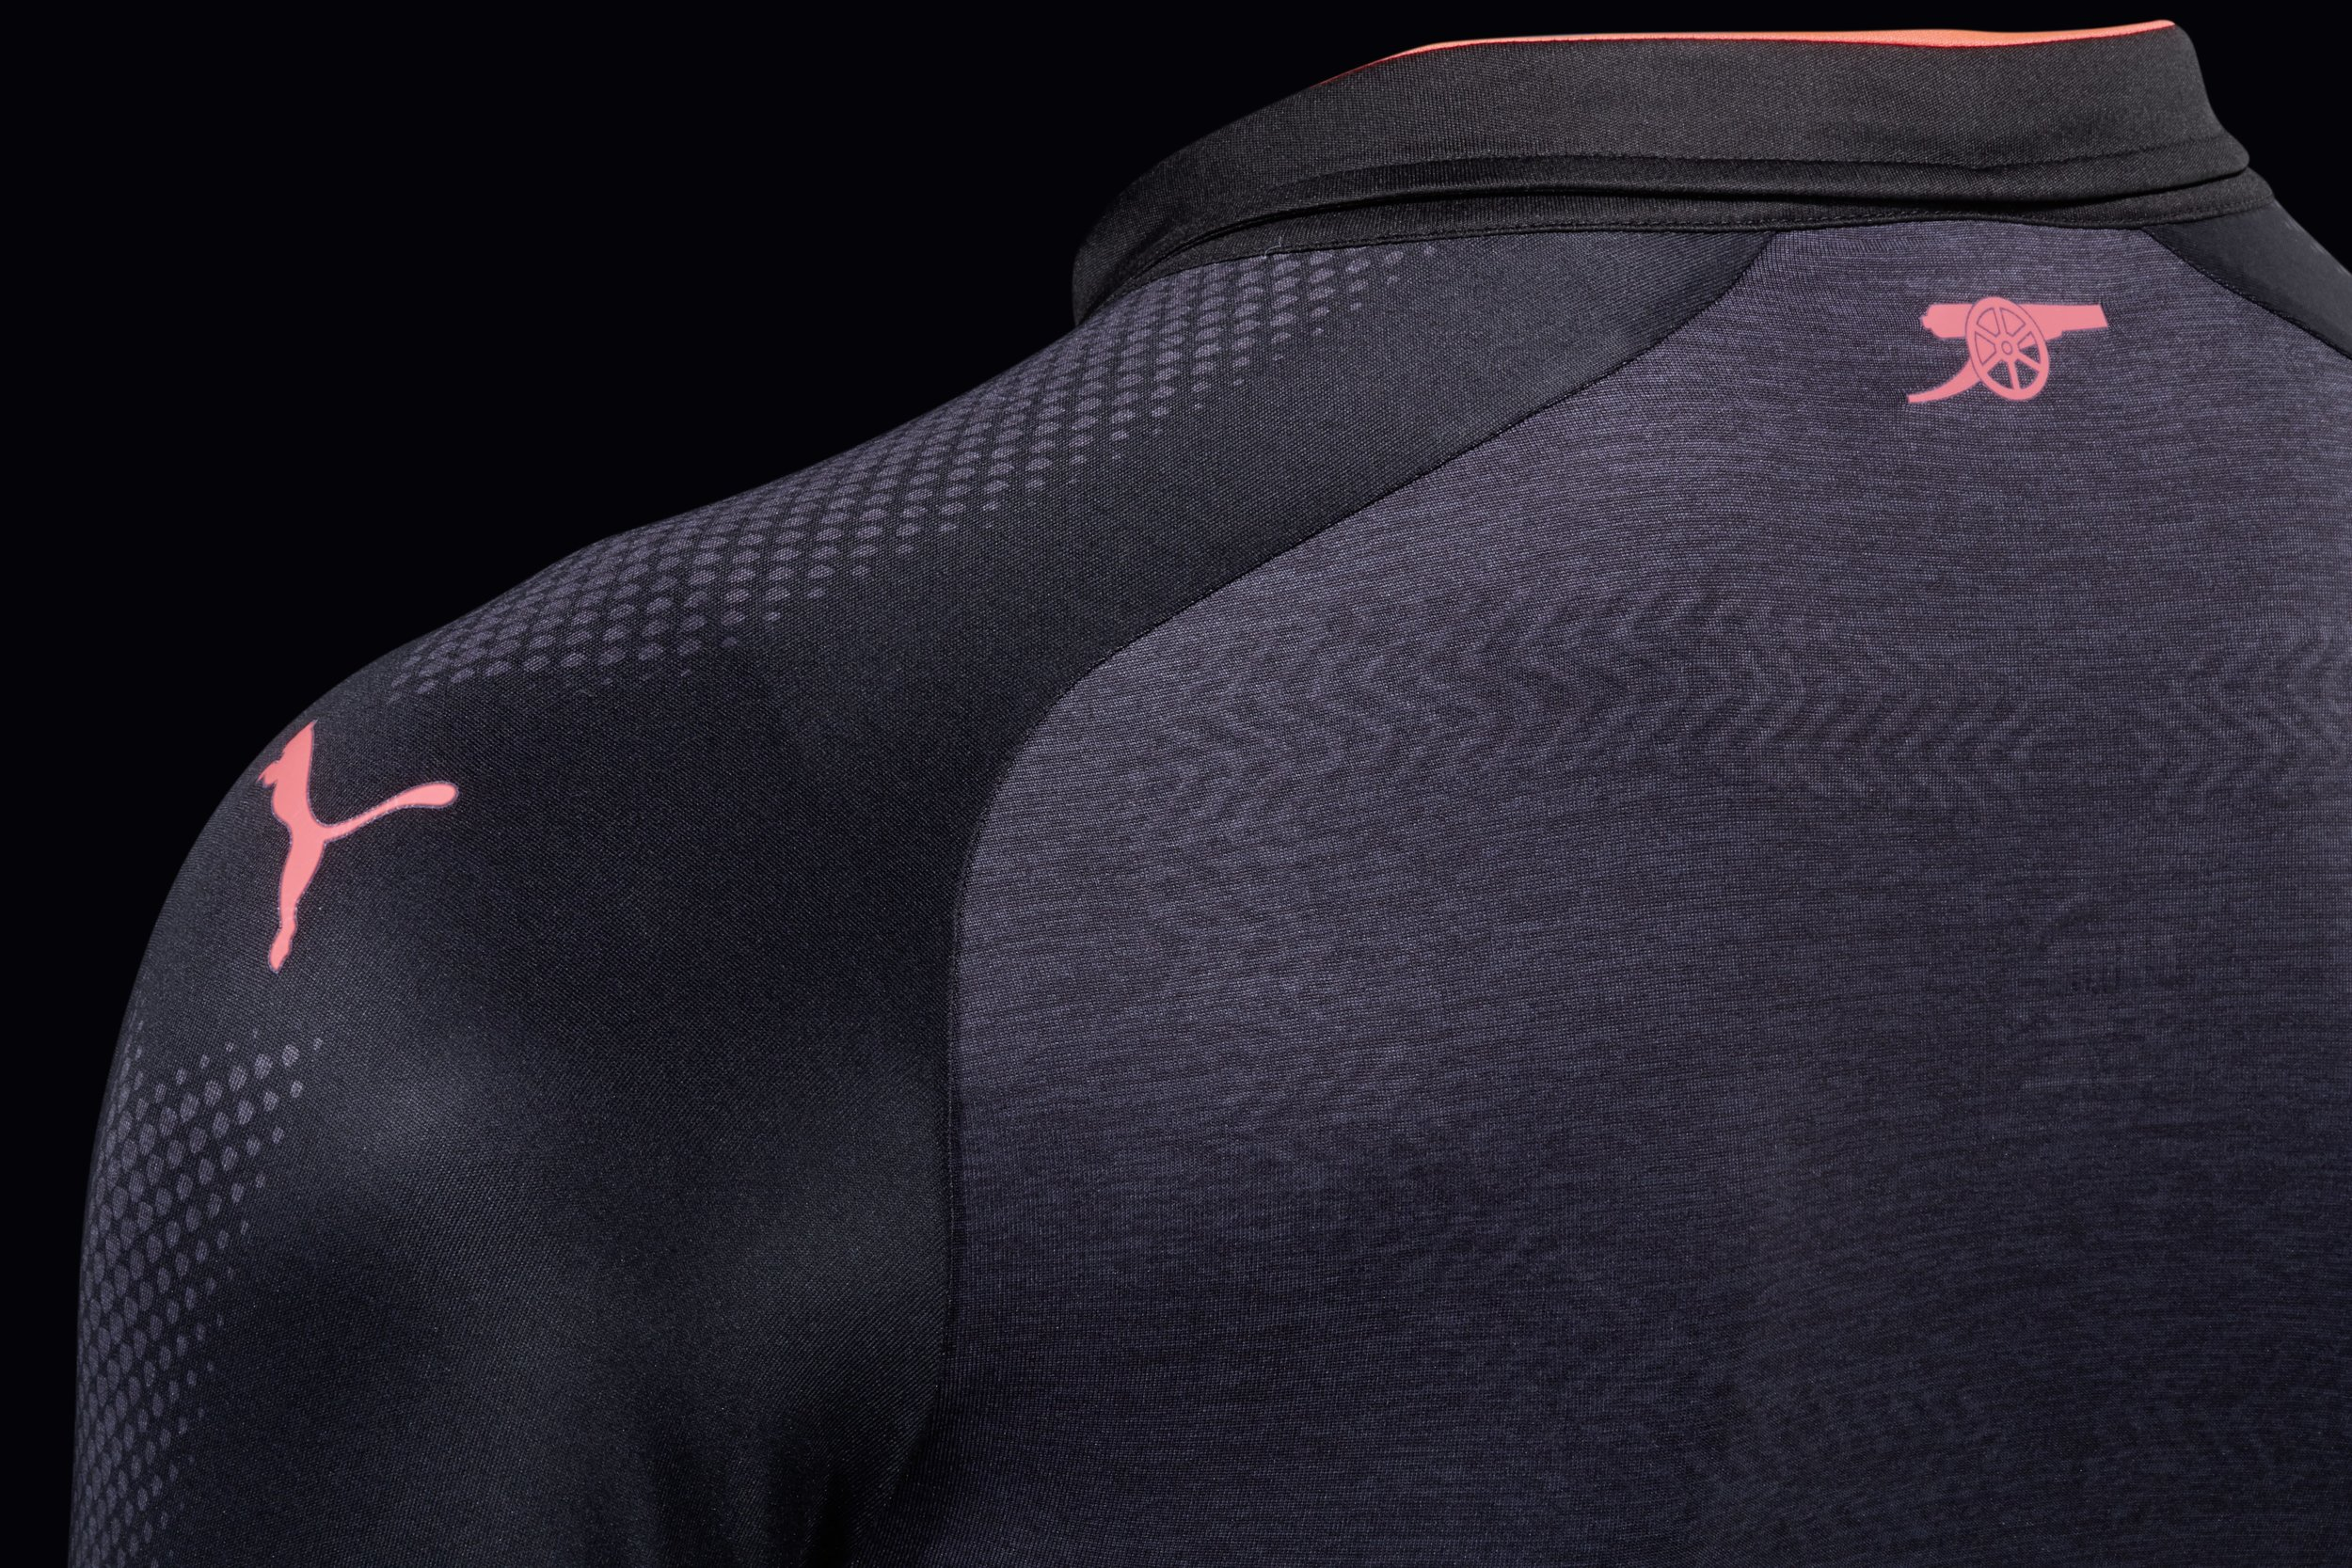 17AW_PR_TS_Football_Step-Out_Shirt-Details-Arsenal_2-min.jpg